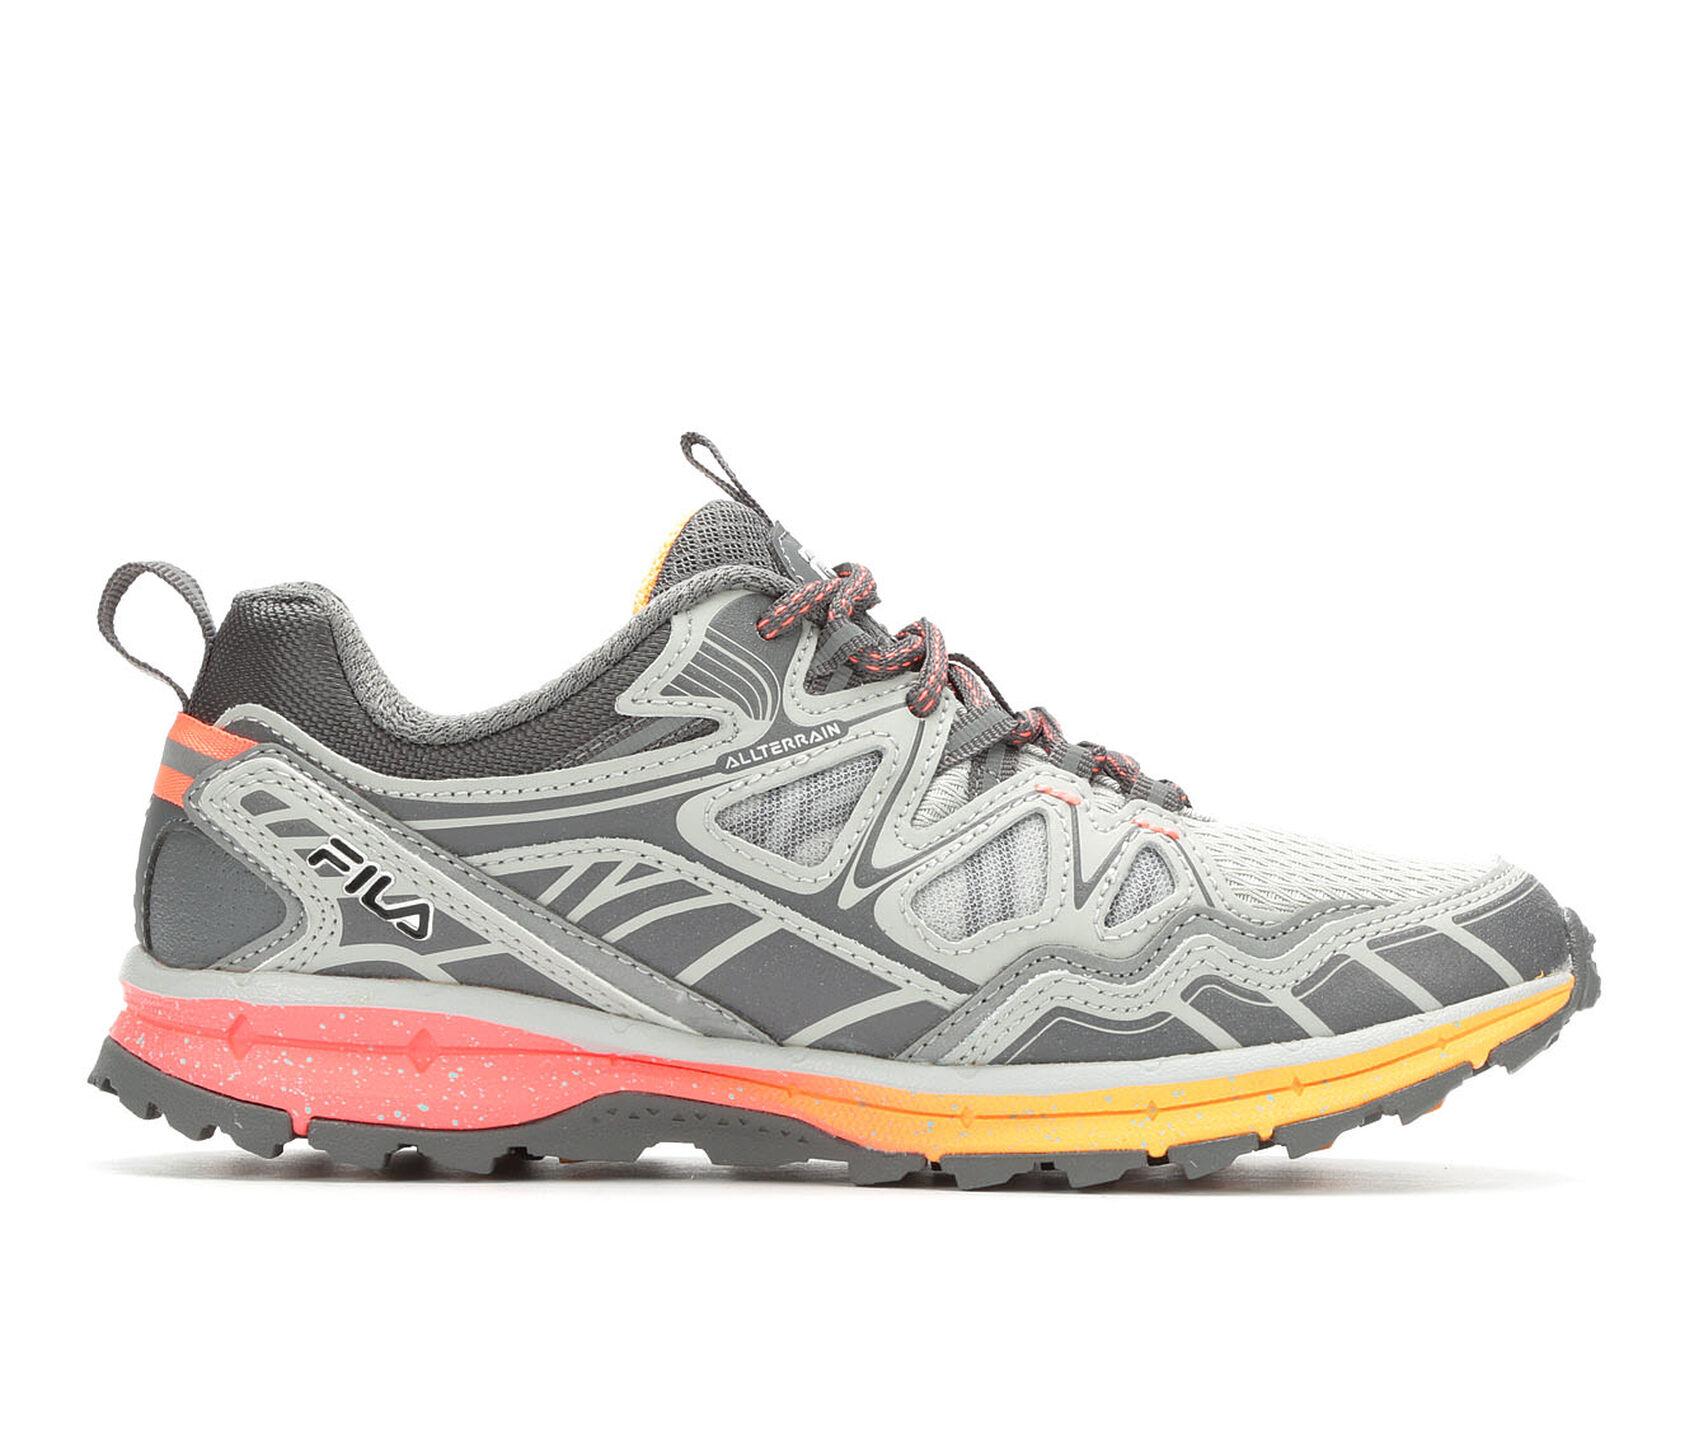 aa1ce0458127 Women s Fila TKO TR 5.0 Trail Running Shoes